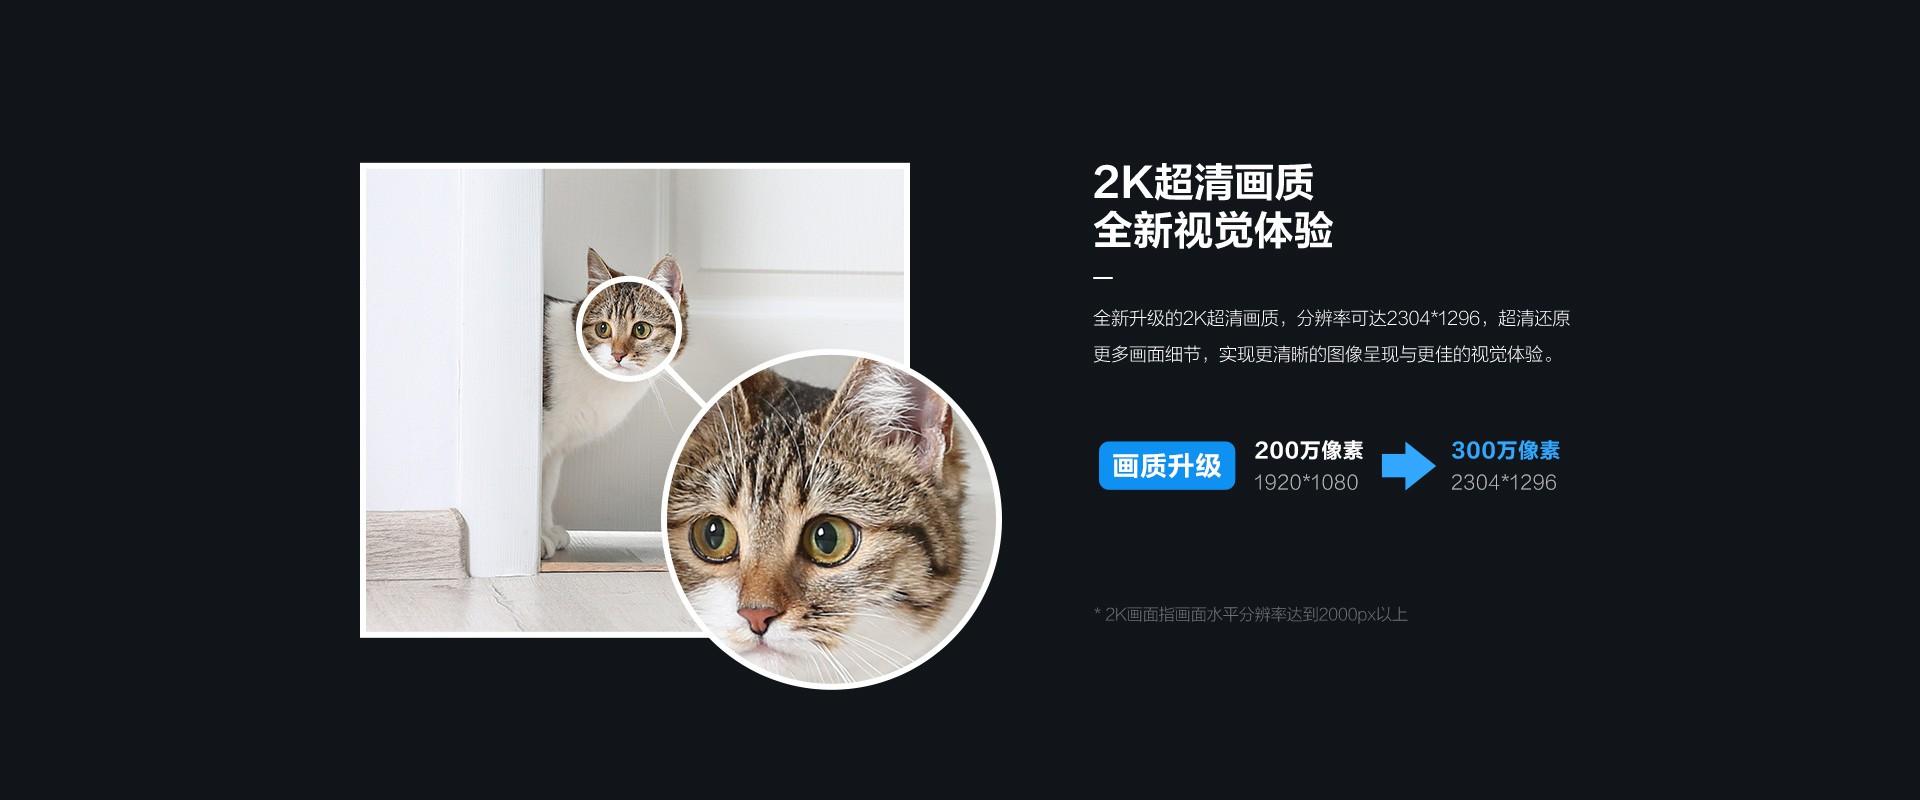 C6CN-3MP-web_04.jpg